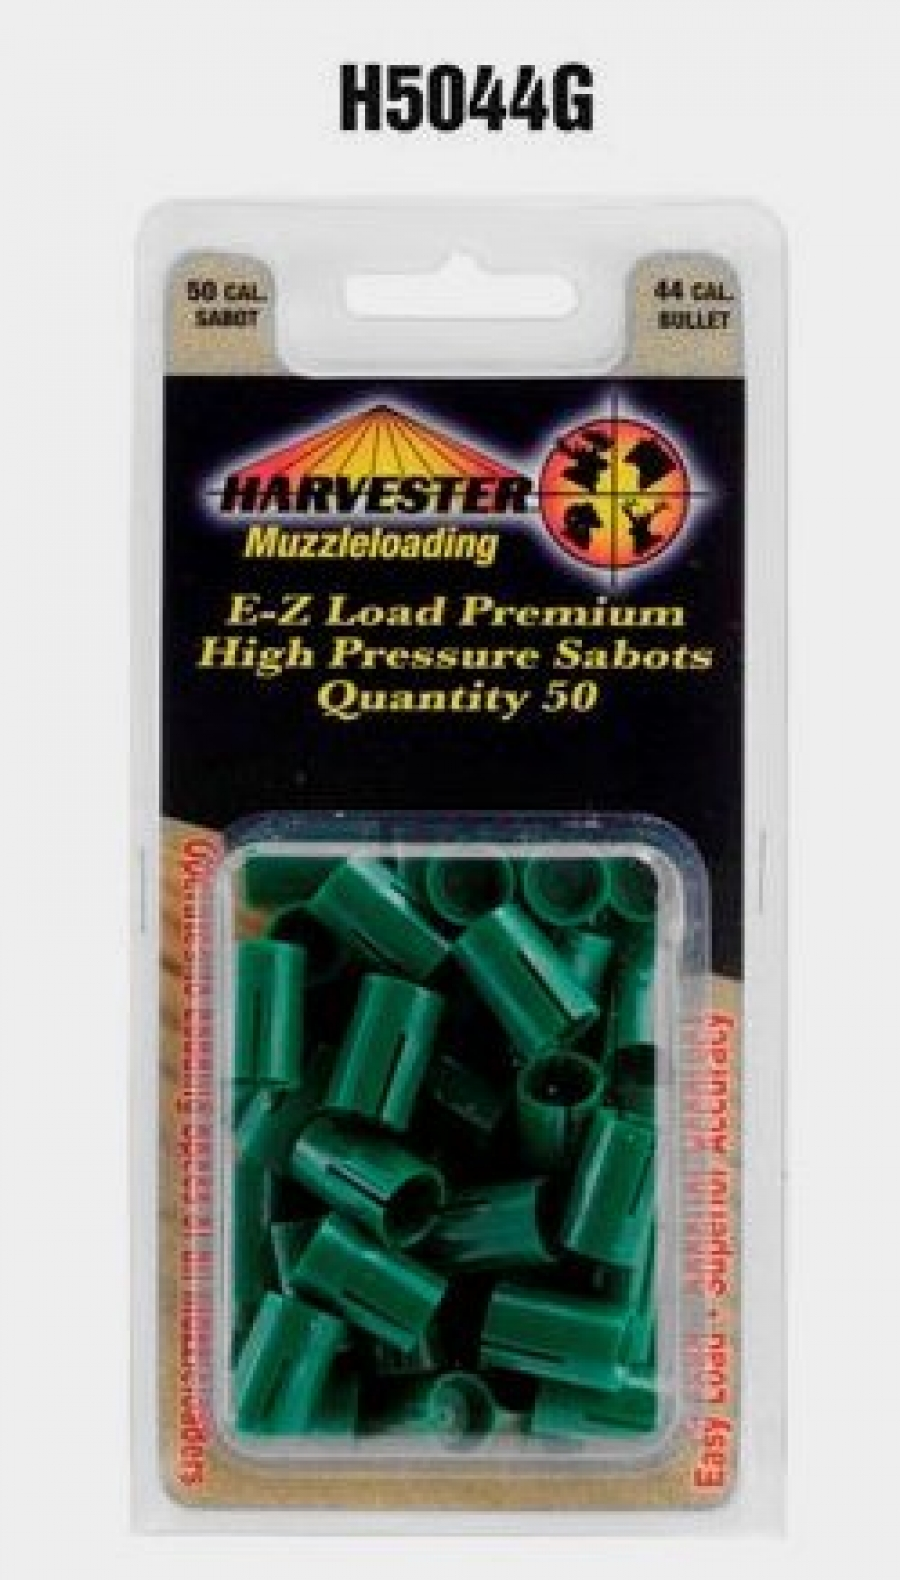 50 Cal Sabot for .429-.430 Cal Bullet - Pack Qty: 50